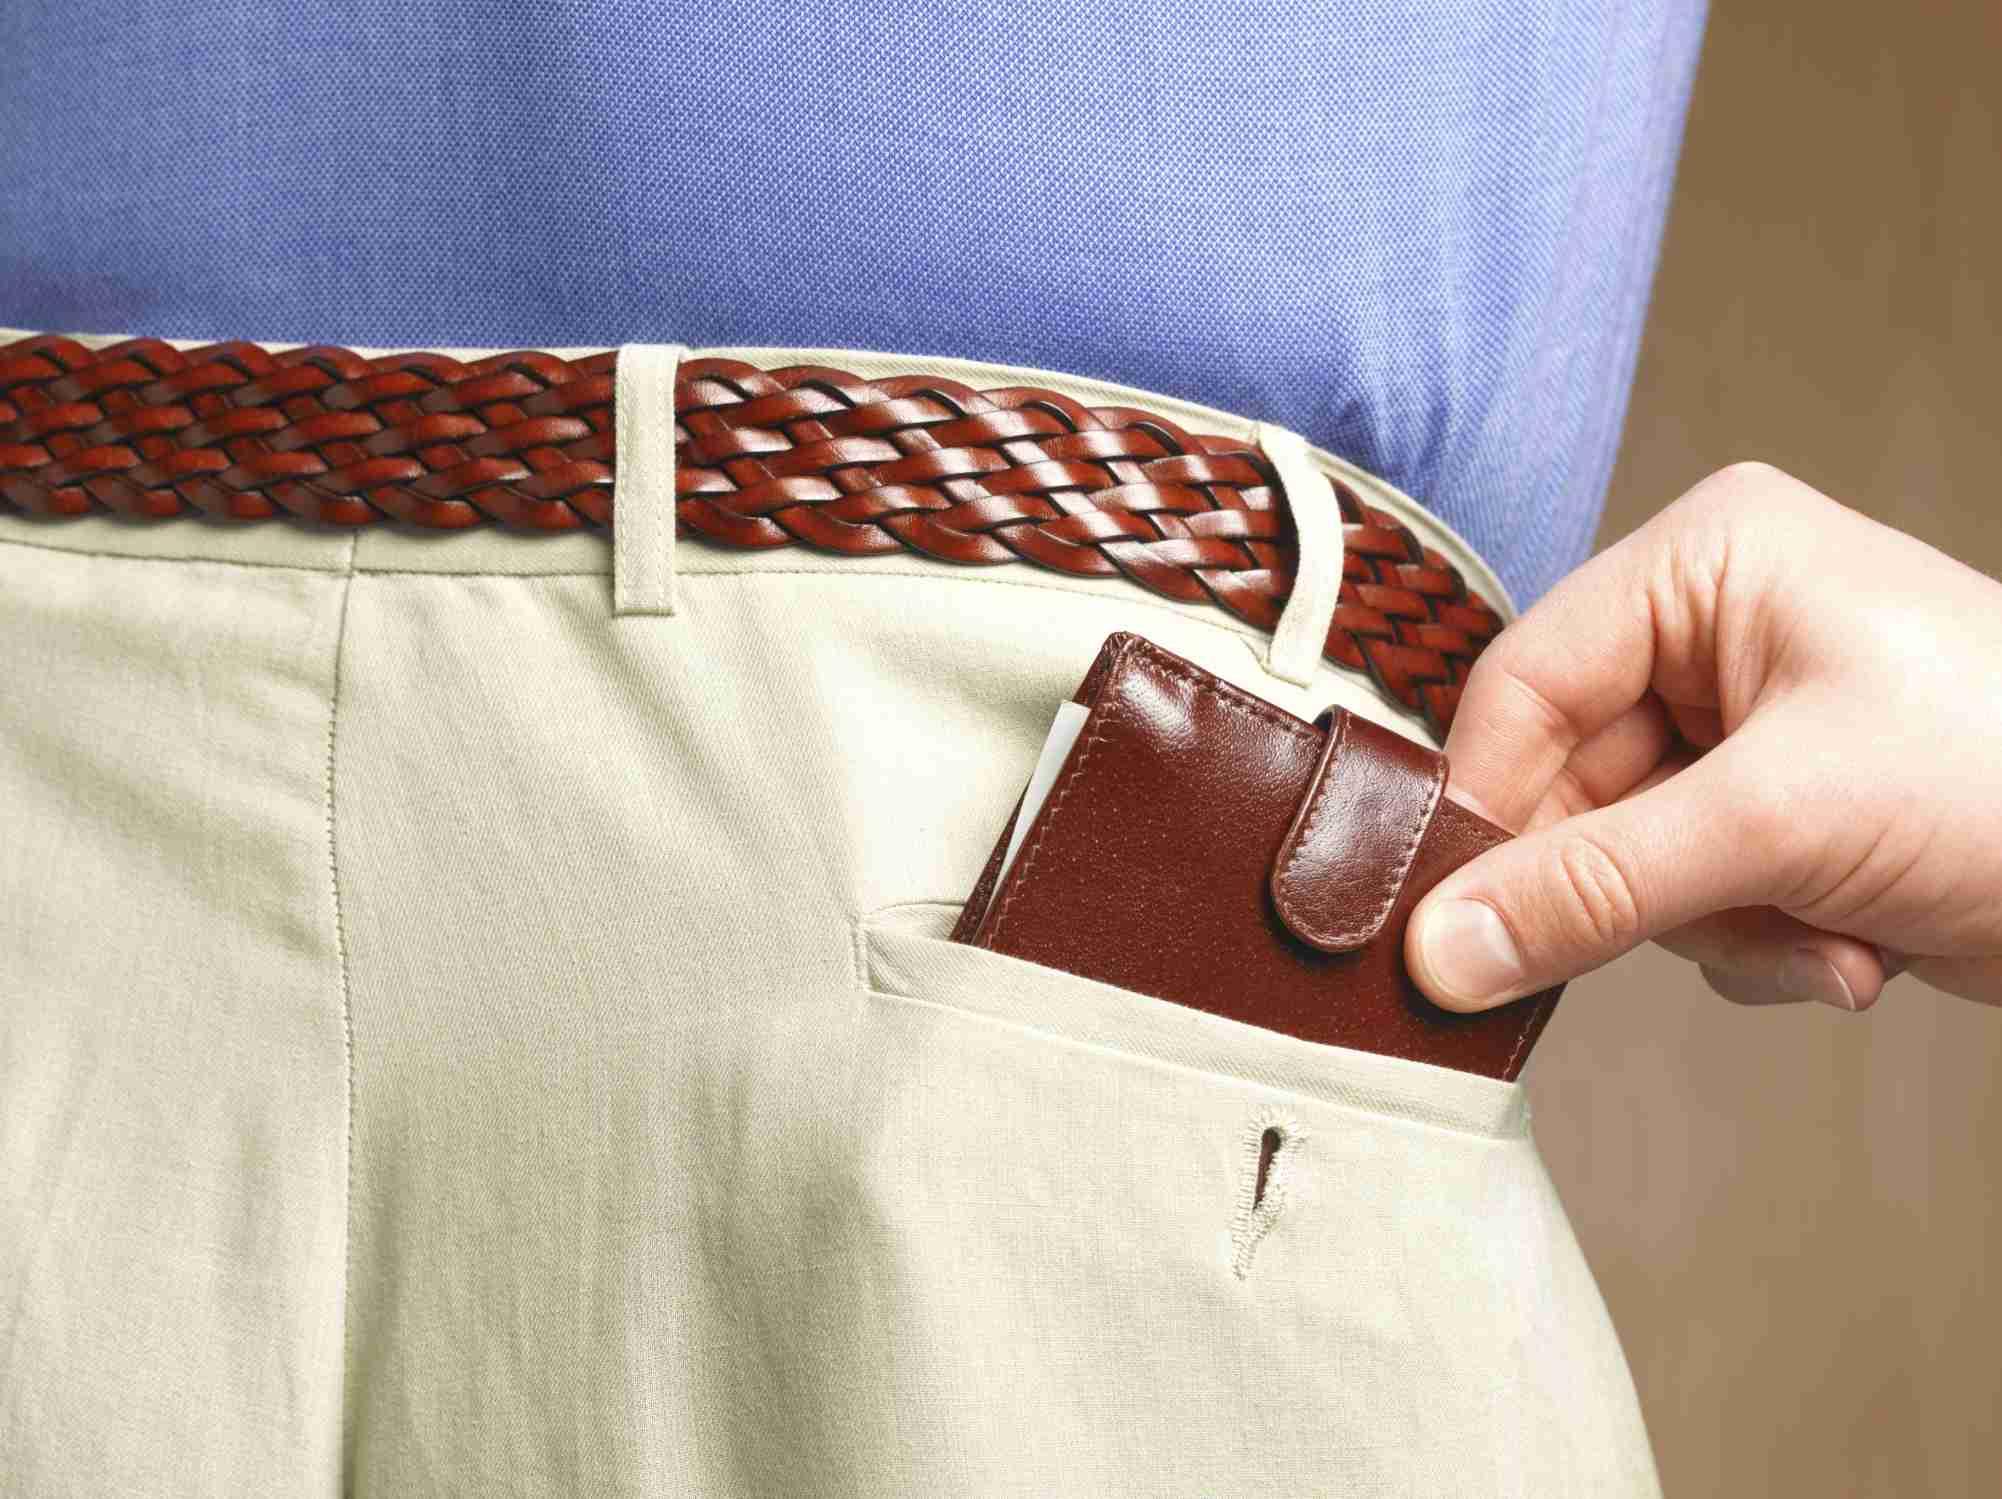 Pickpocket stealing wallet